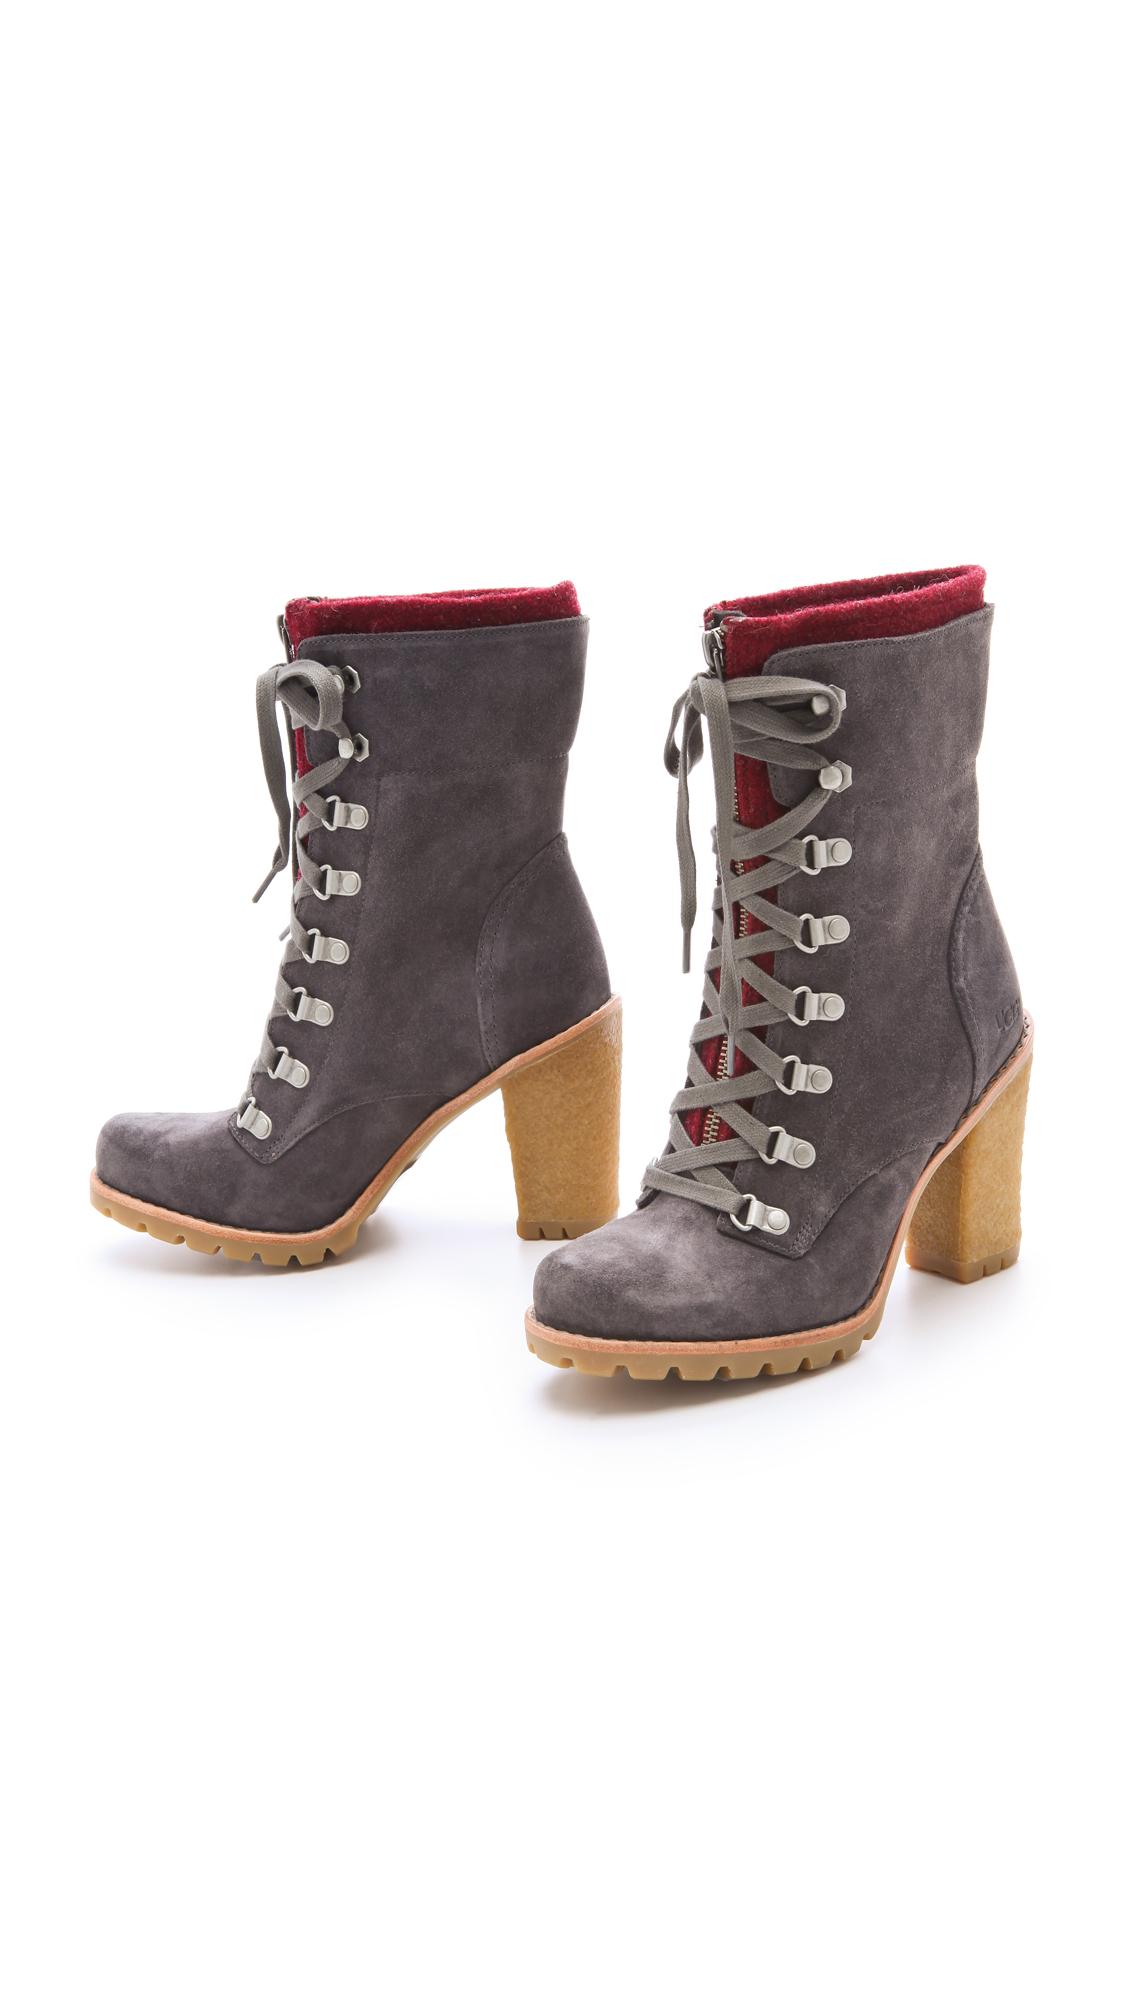 55ff717cf5c UGG Australia W Fabrice Boots with Lug Sole | SHOPBOP